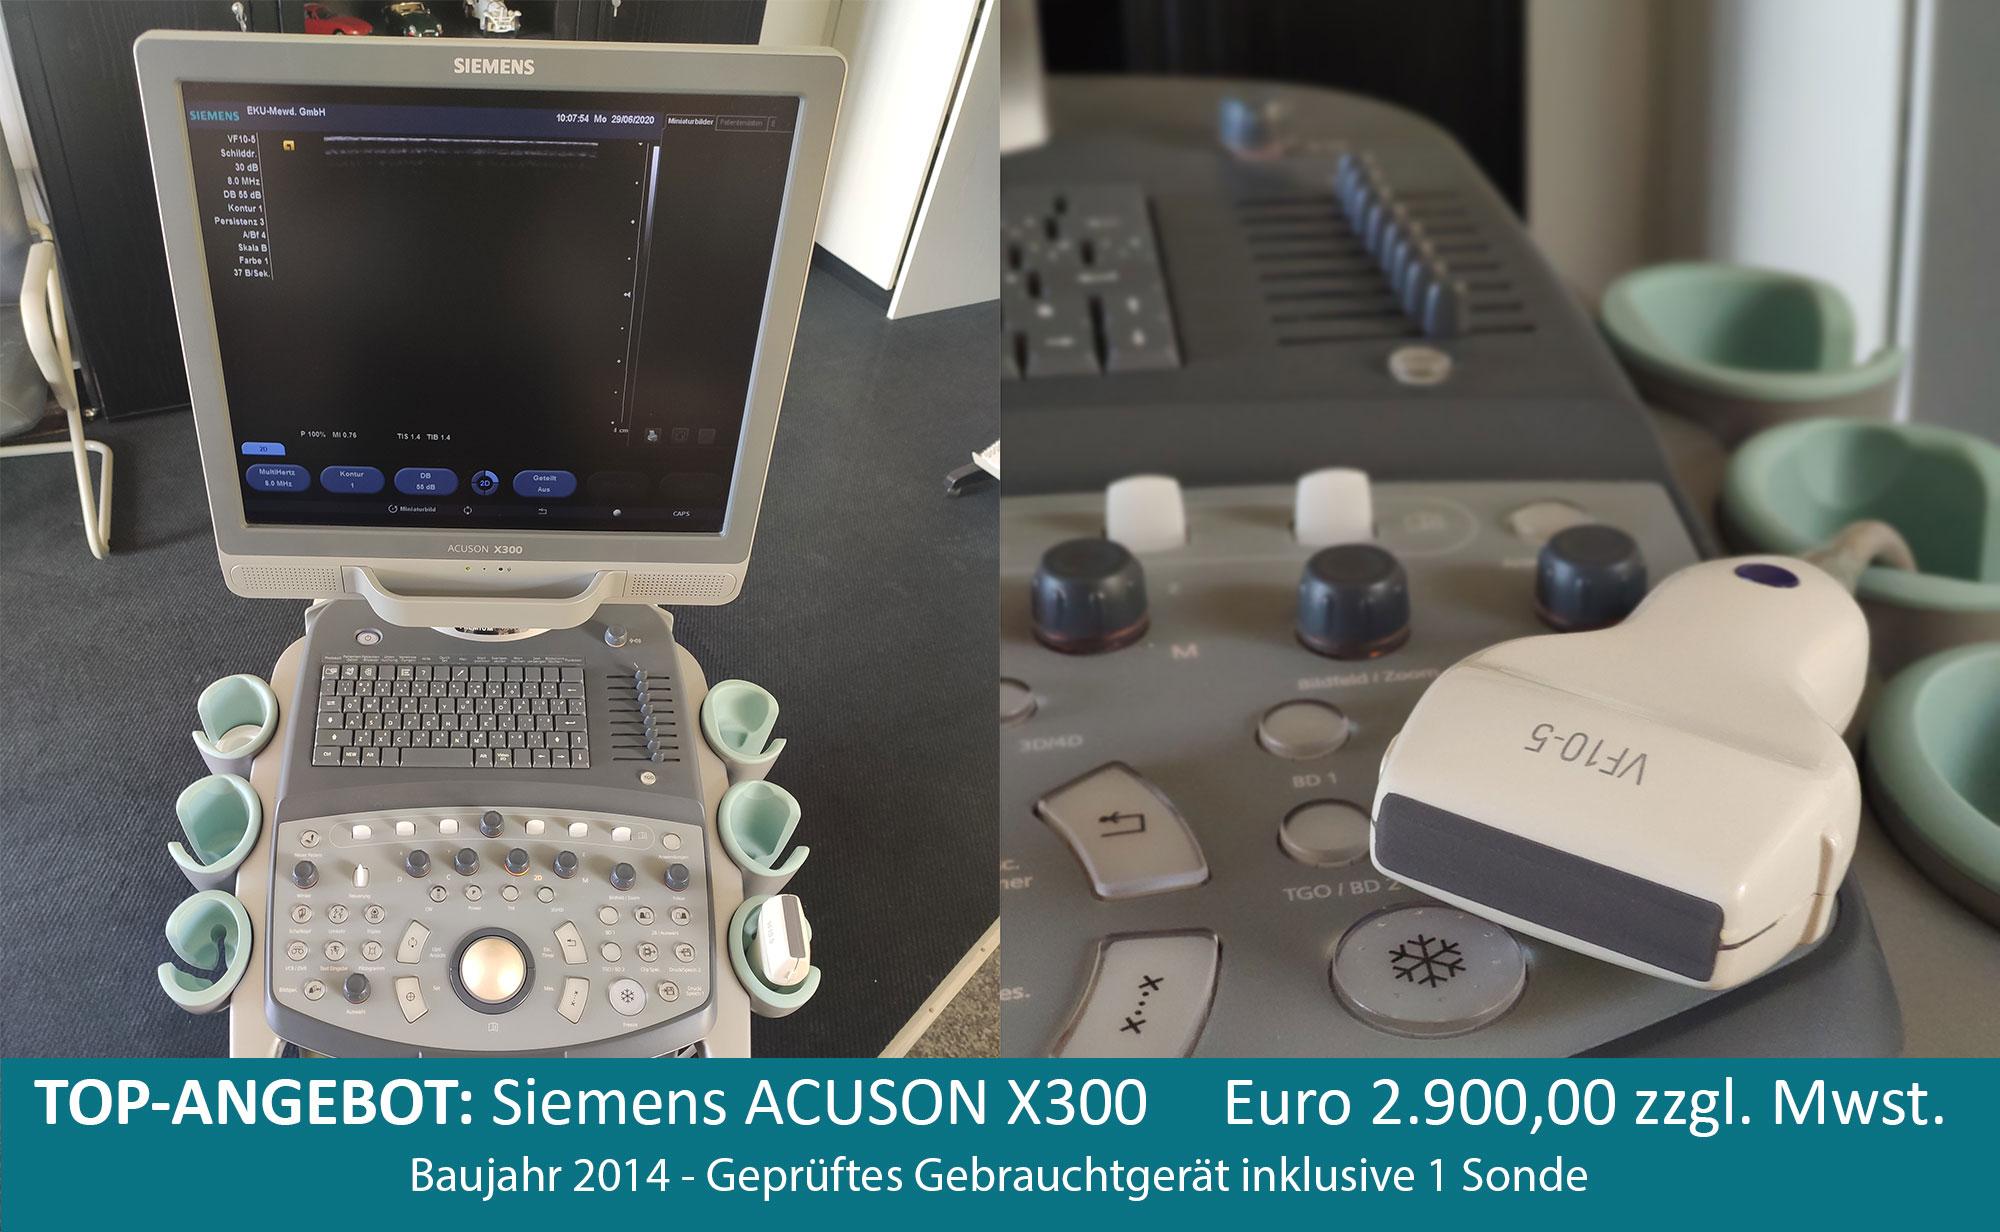 Sonograph X300